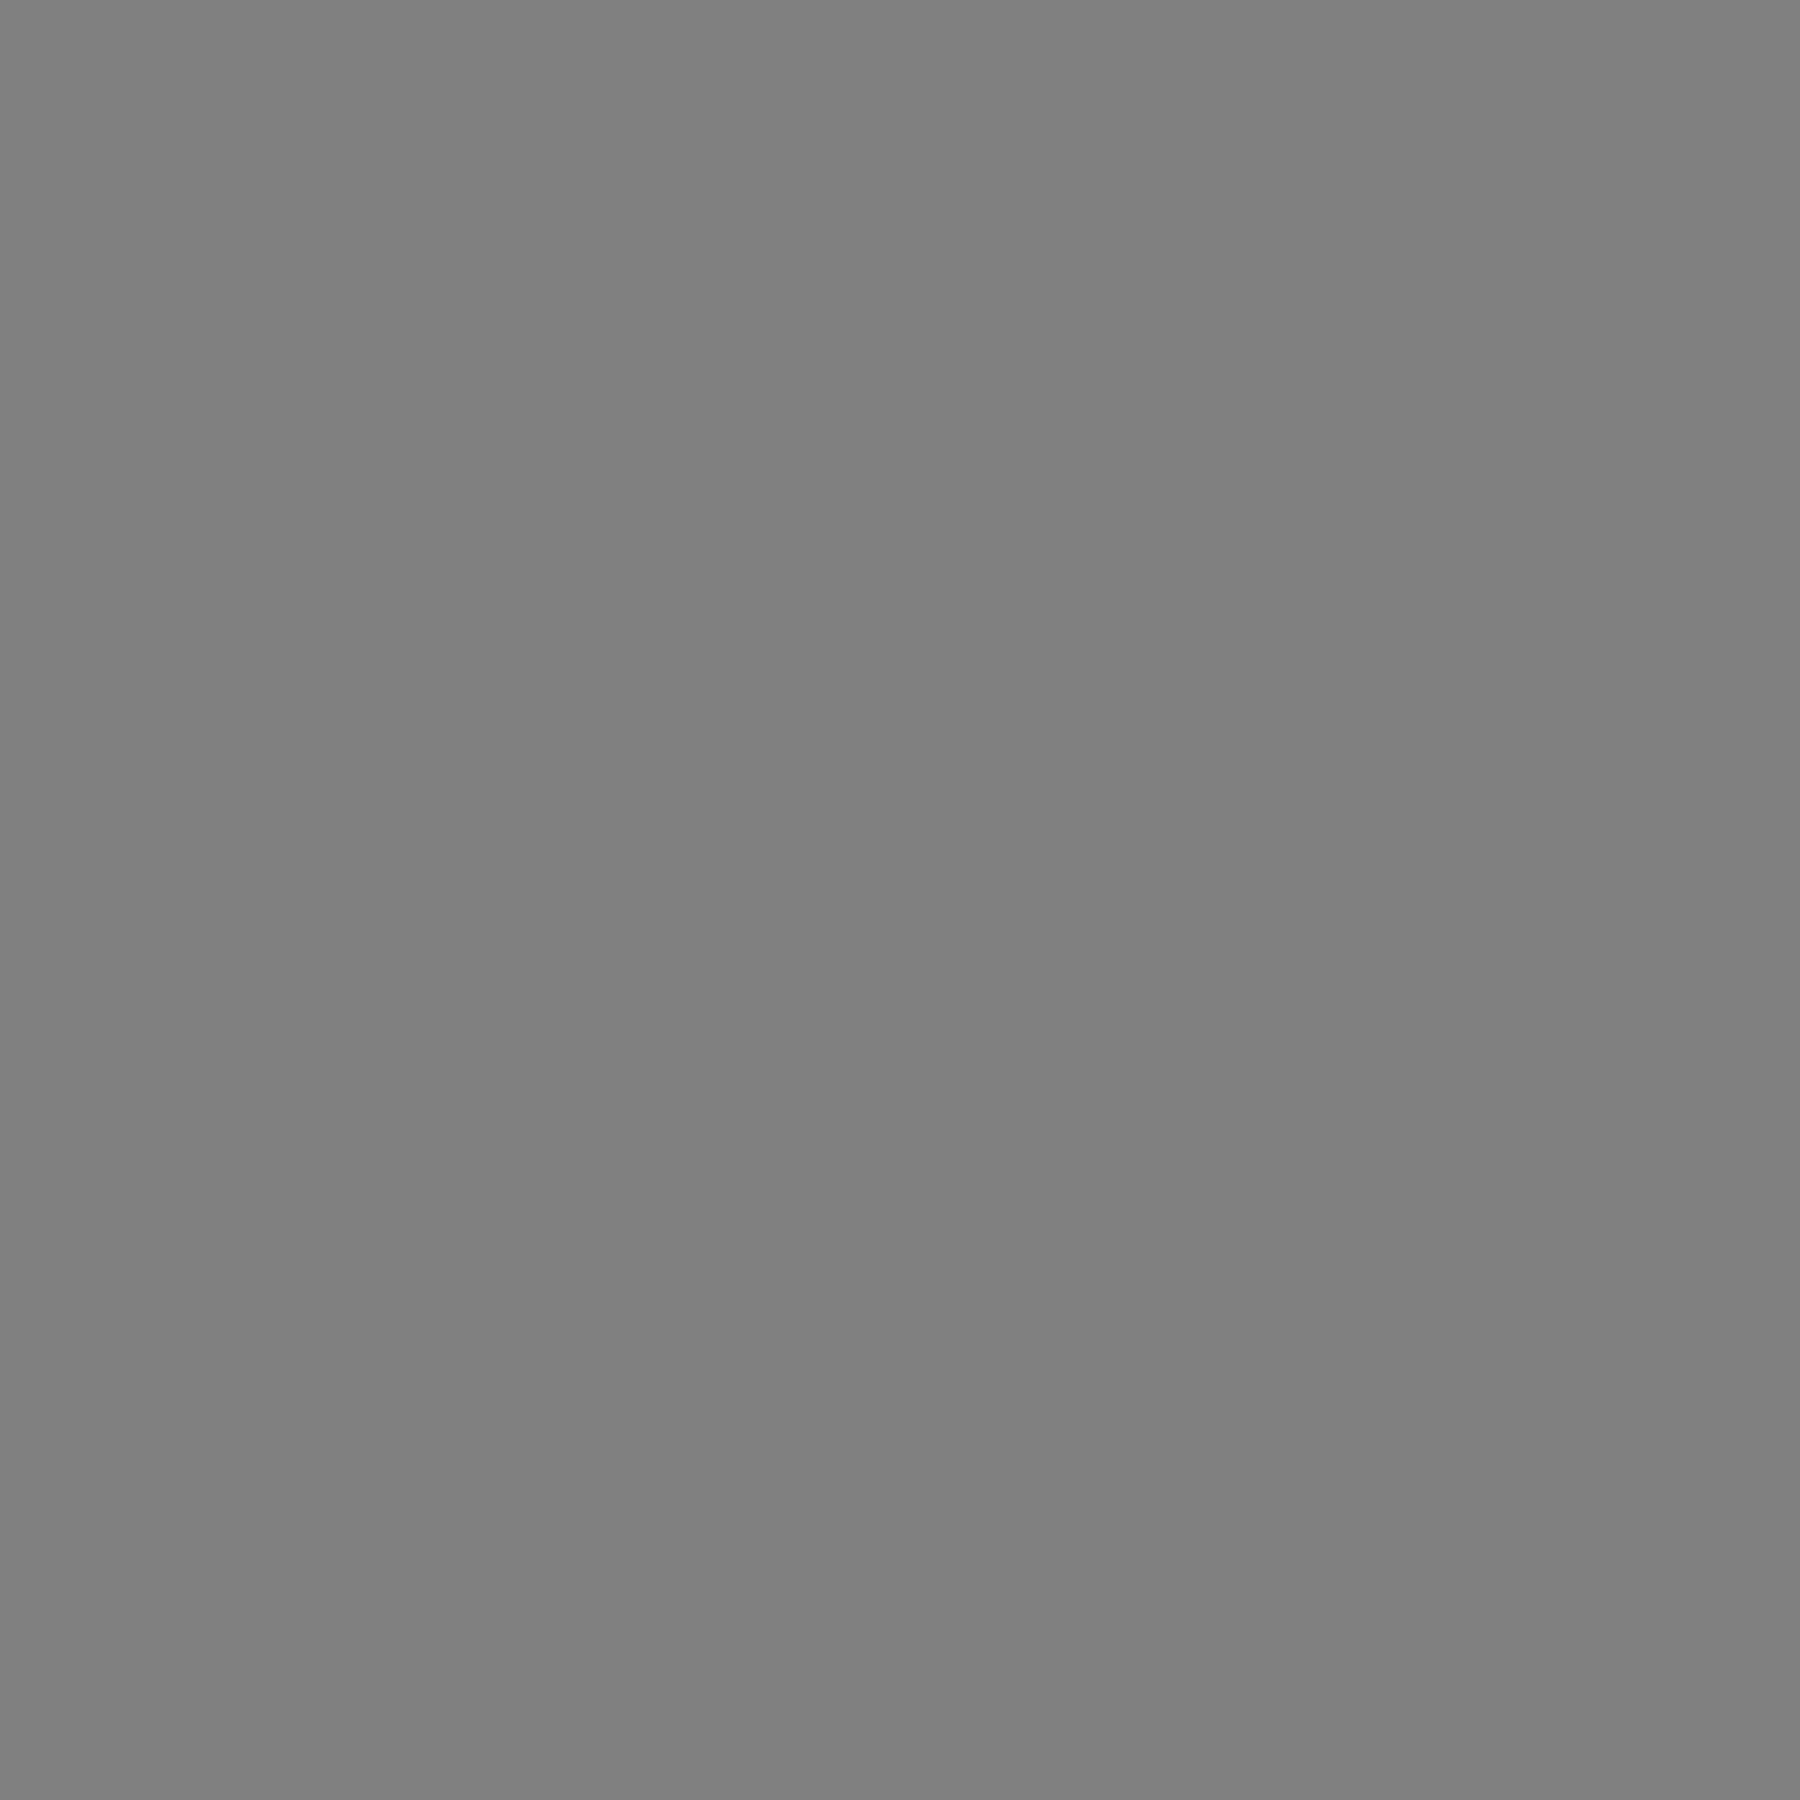 portait placeholder 2.jpg